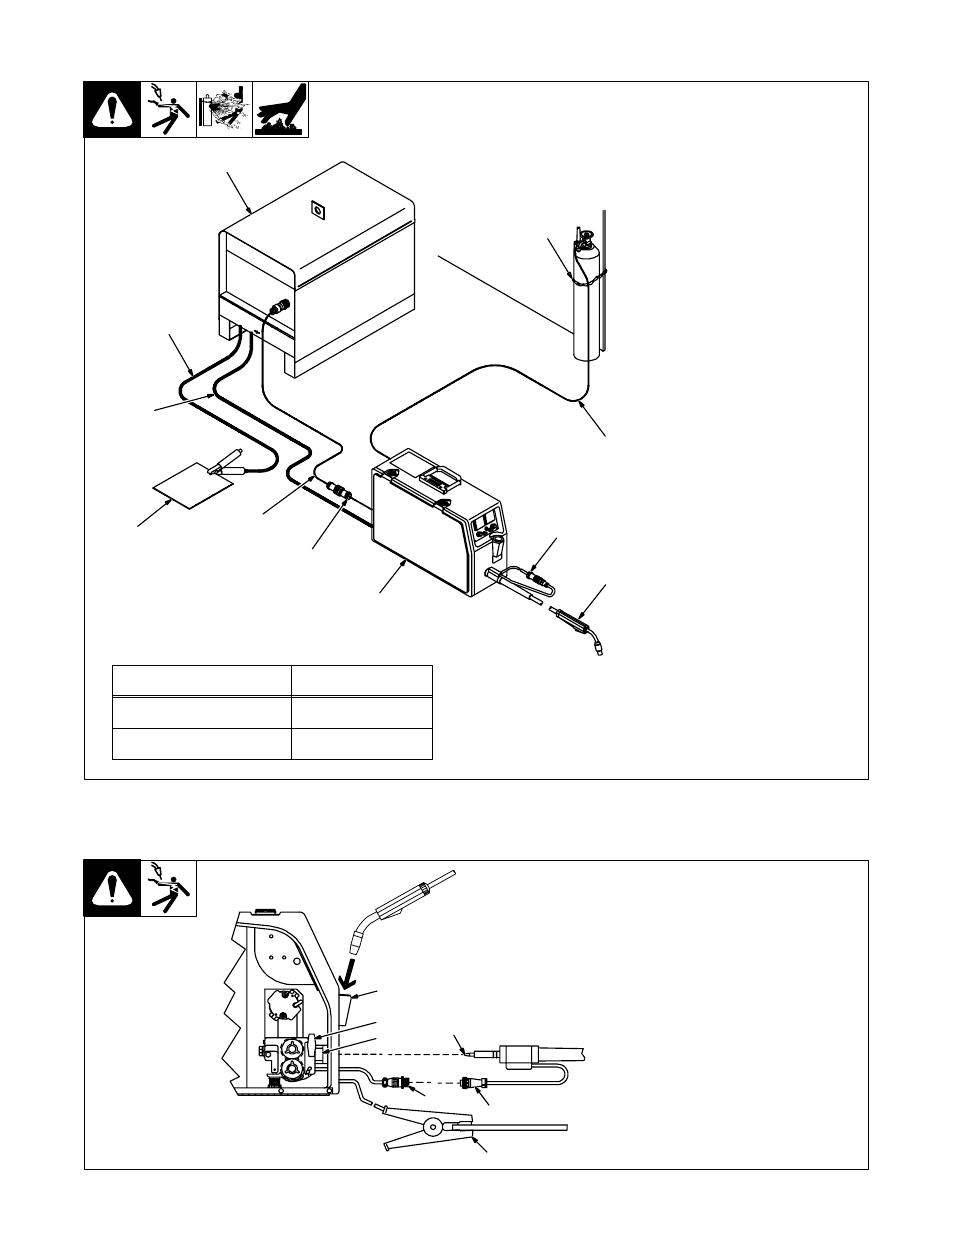 Gun Rack Wiring Diagram | Wiring Liry Rack Wiring Diagram on